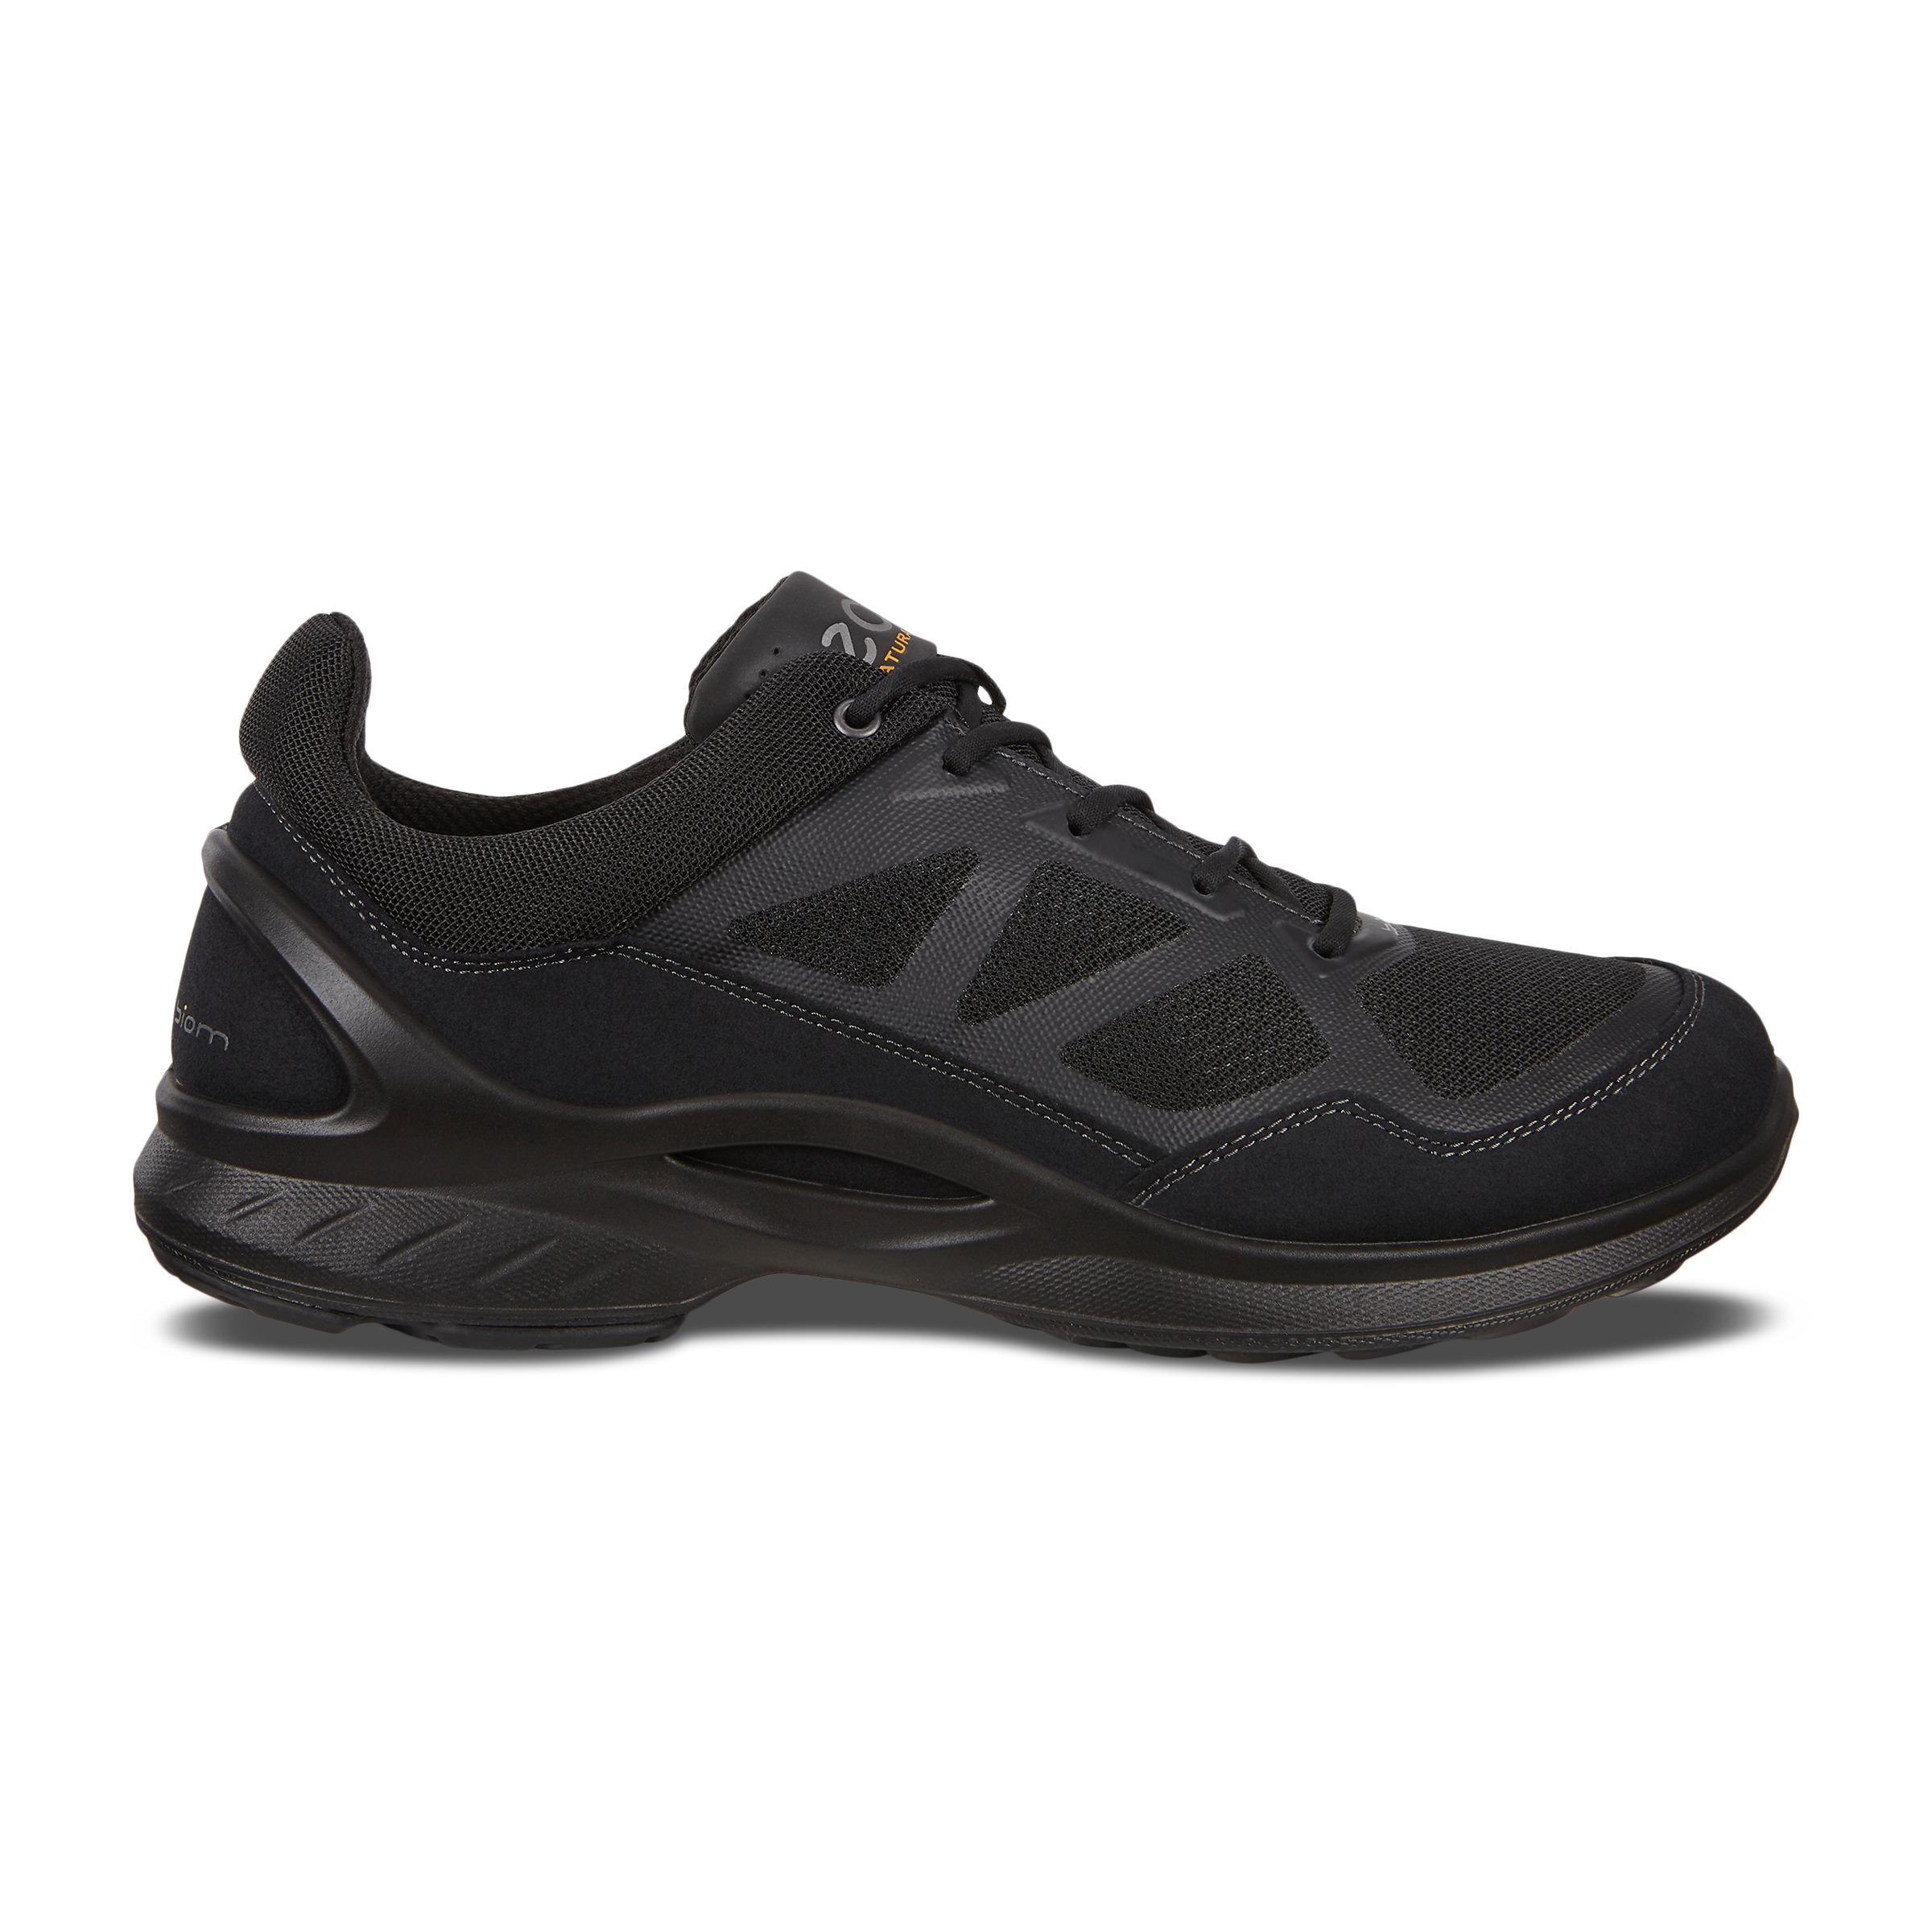 ECCO Biom Fjuel M Outdoor Shoe Sneakers Size 10-10.5 Black